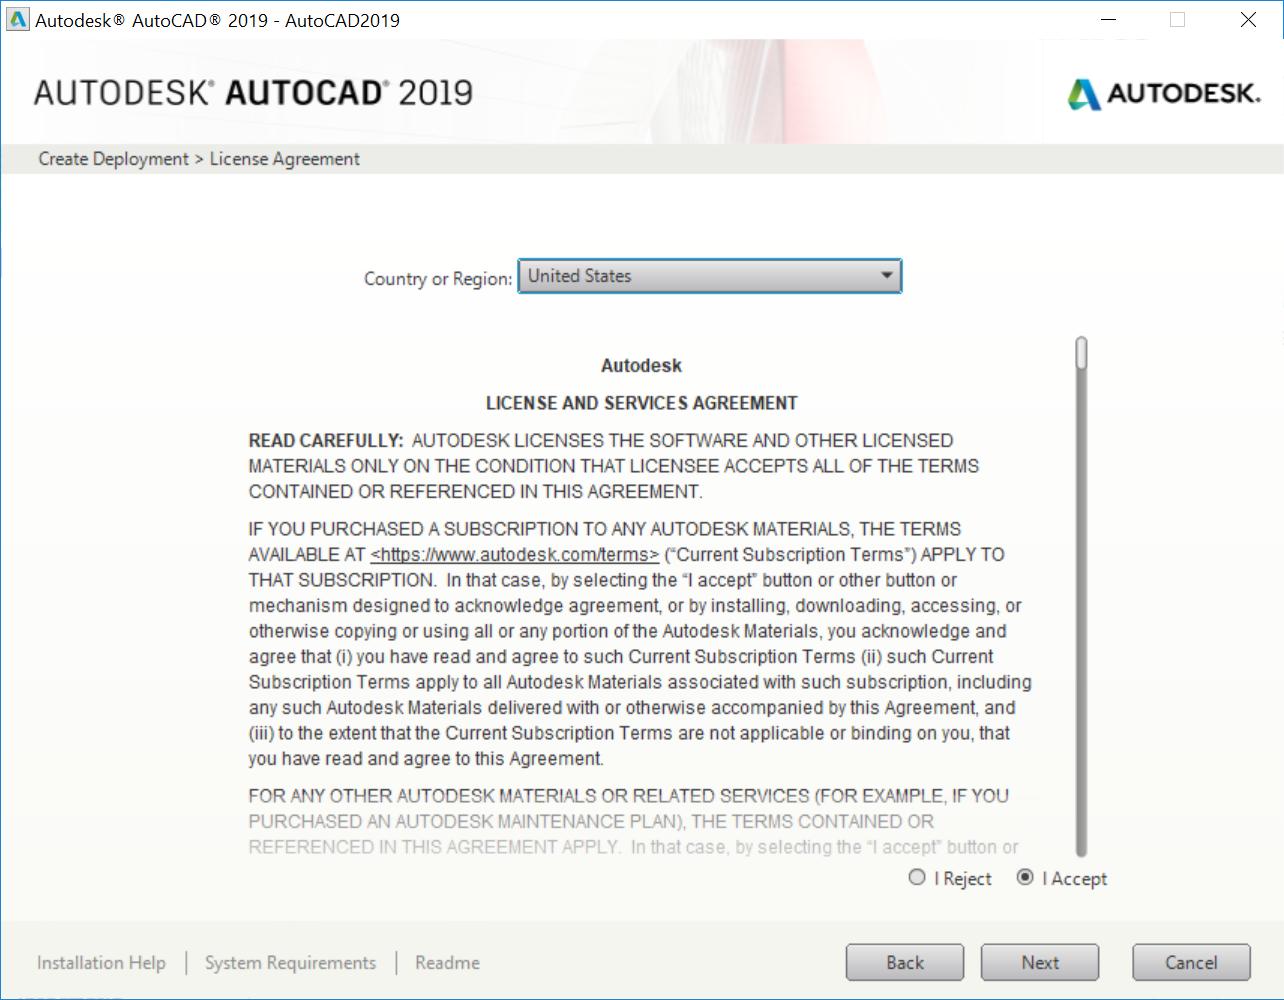 Autodesk AutoCAD 2019 - Applications